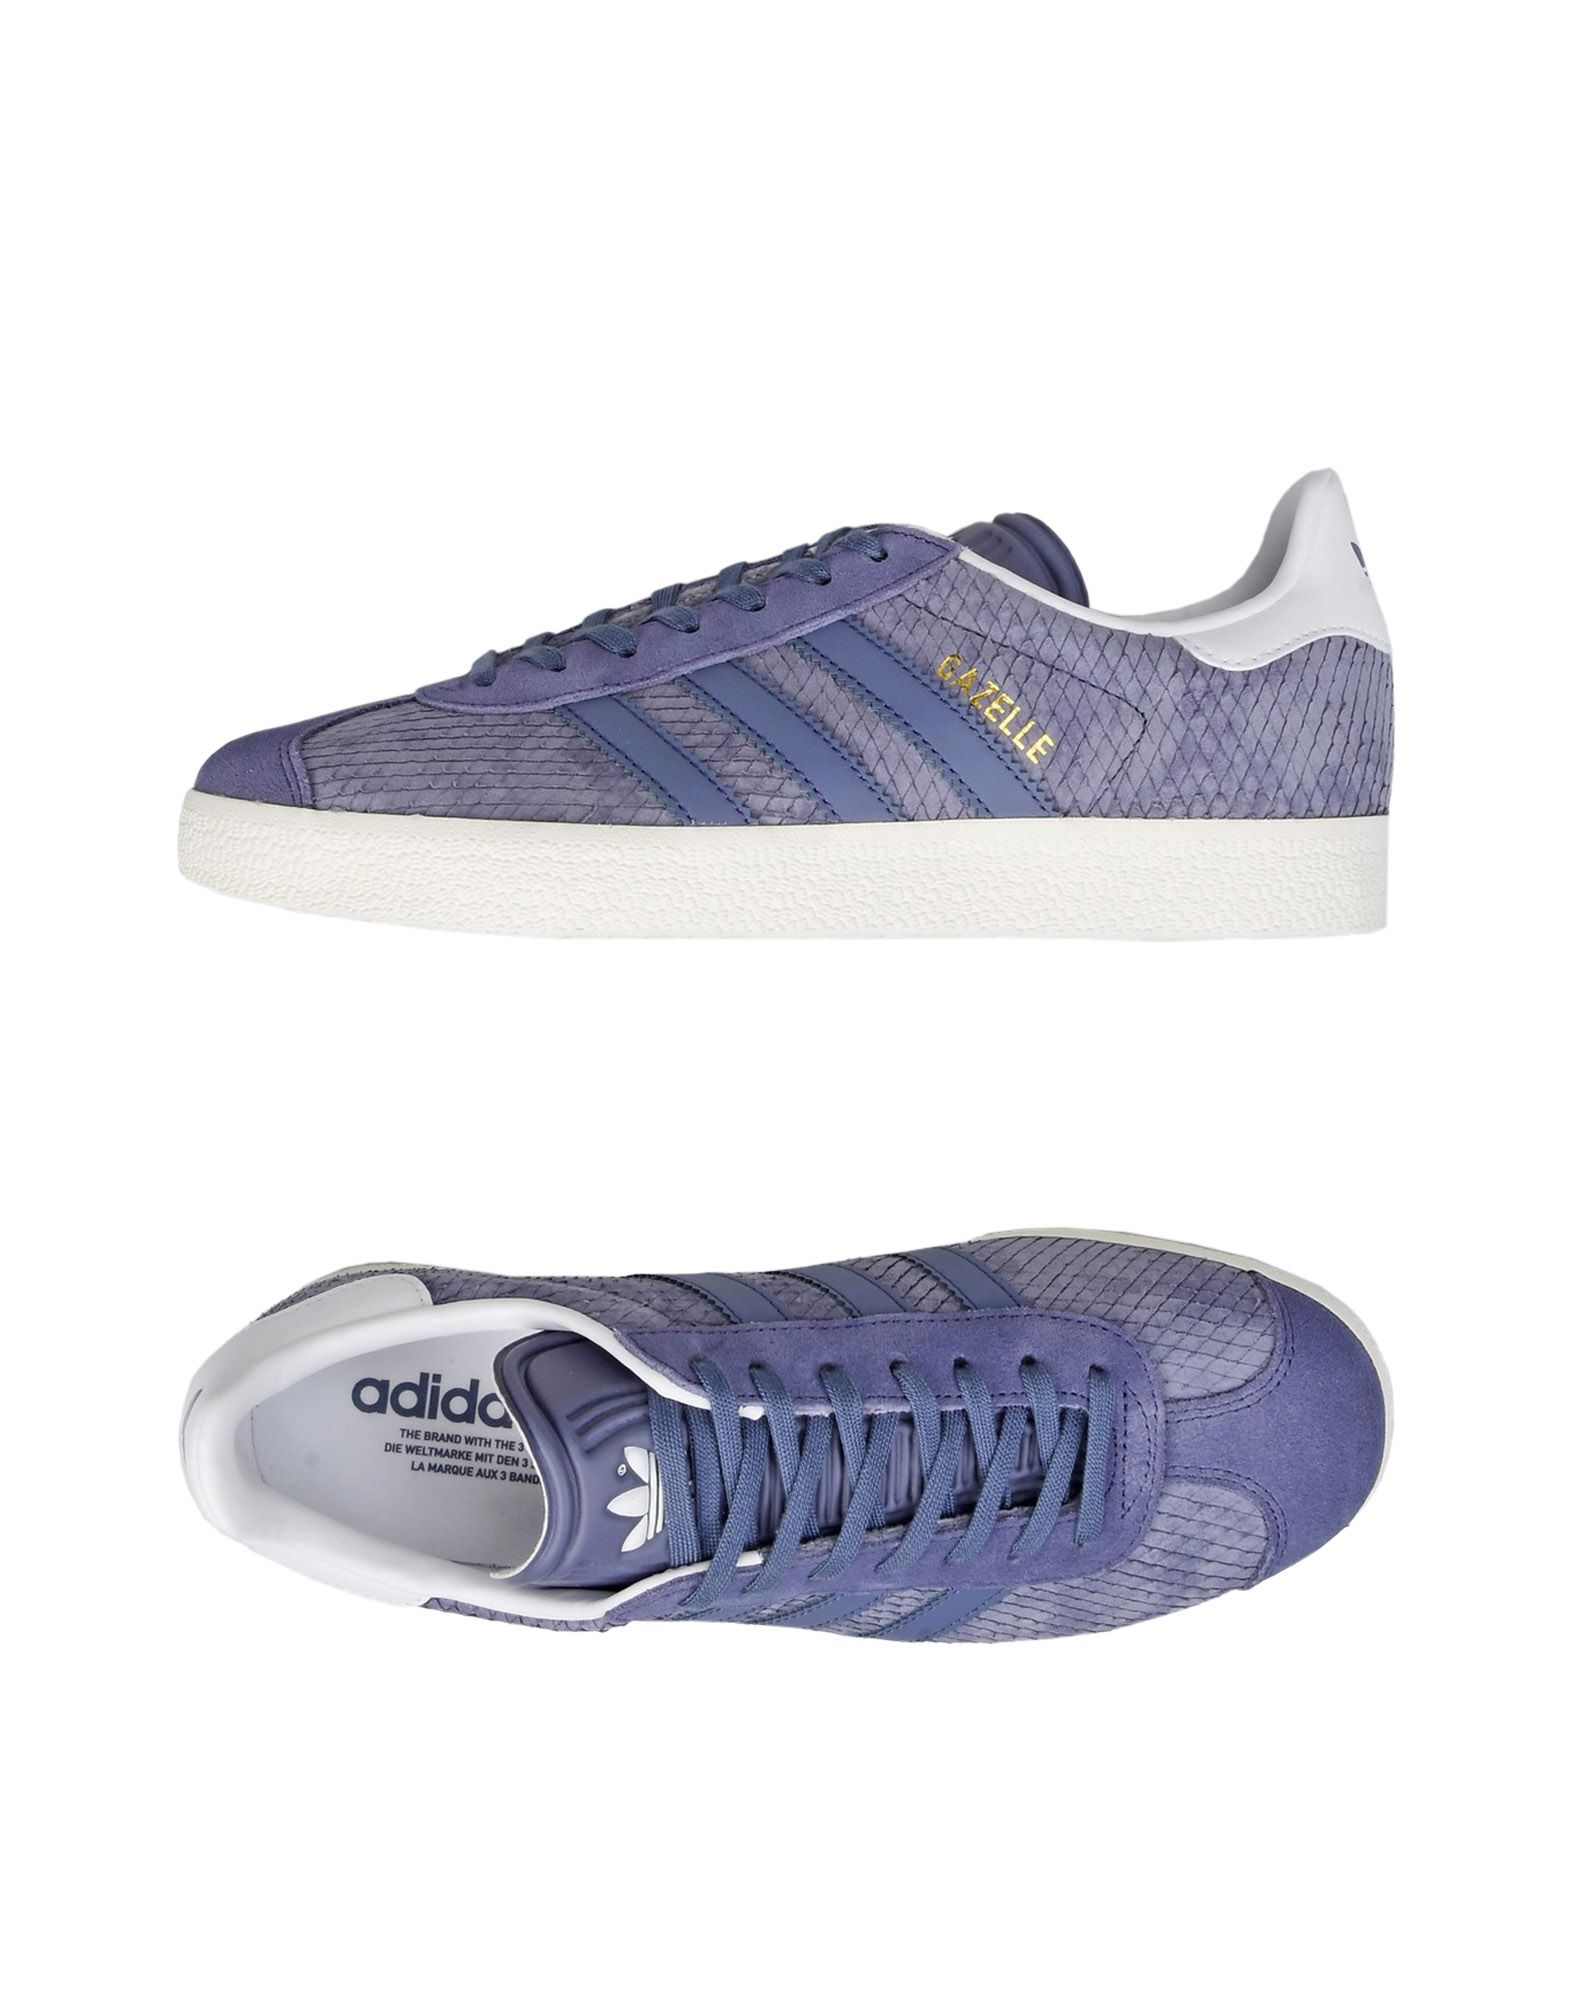 Baskets Adidas Originals Gazelle W - Femme - Baskets Adidas Originals Violet Chaussures casual sauvages